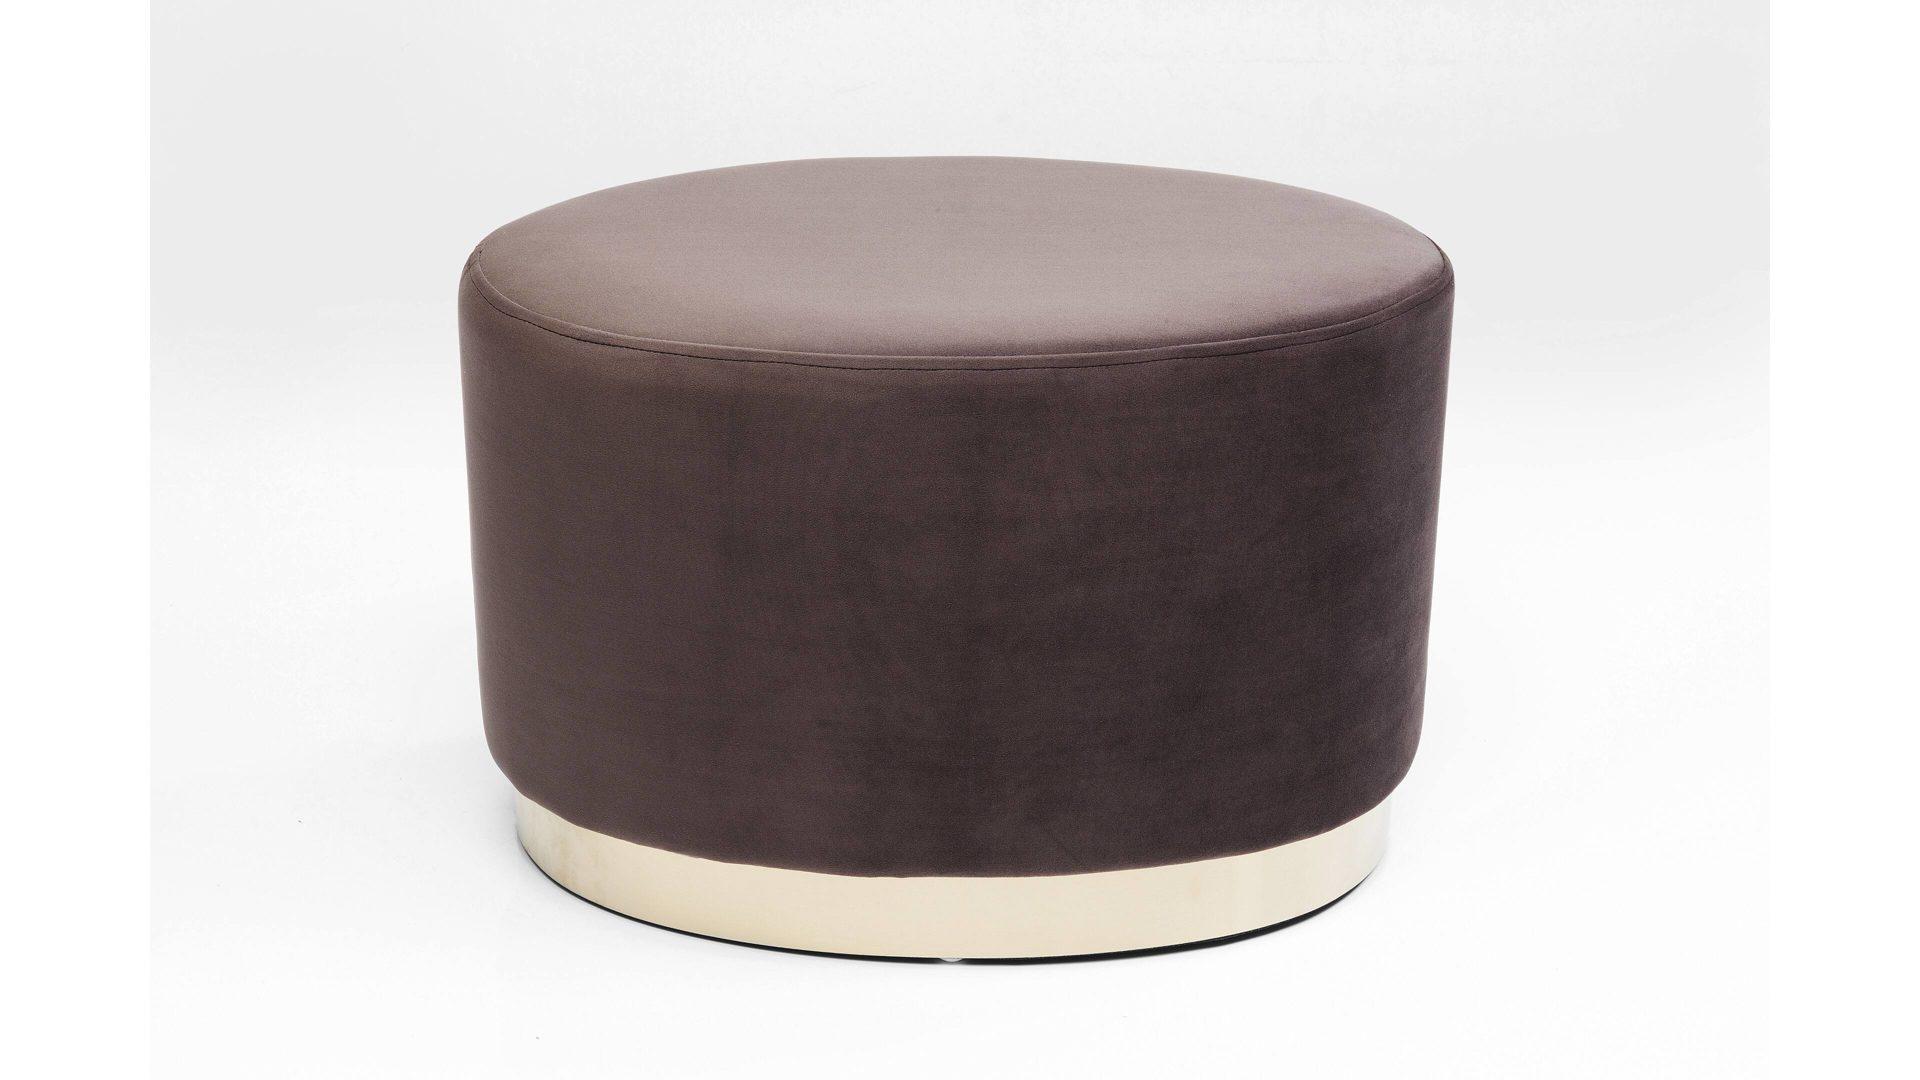 Möbel Eilers Apen Räume Jugendzimmer Kinderzimmer Sessel